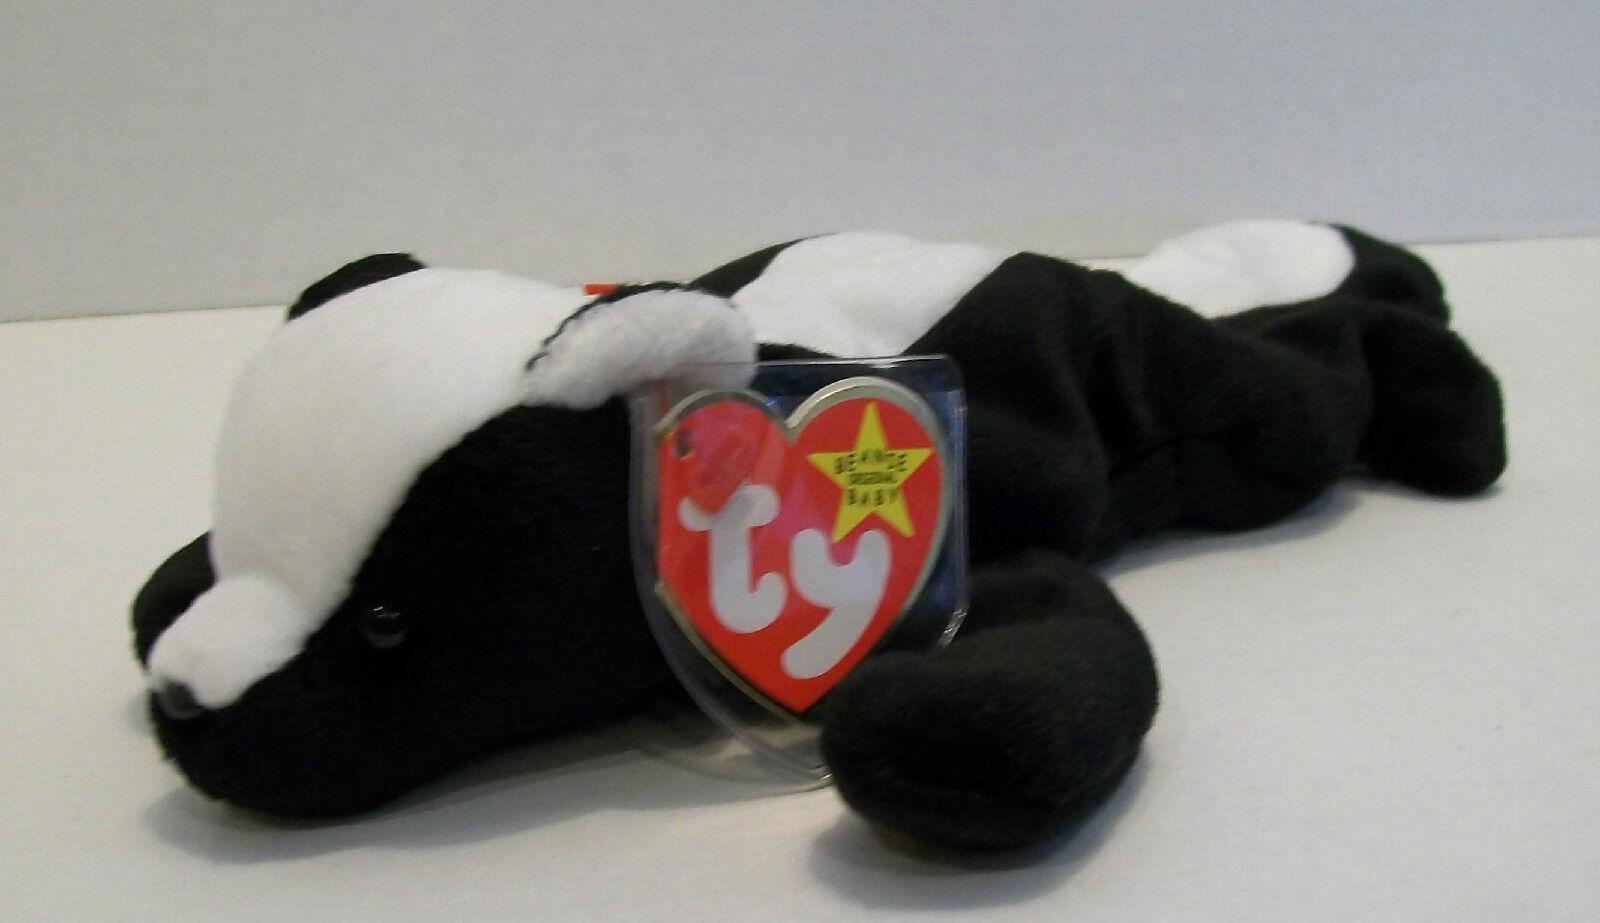 TY Beanie Baby STINKY STINKY STINKY THE SKUNK Retired First Edition Beanbag Plush Stuffed Toy 49cc8a